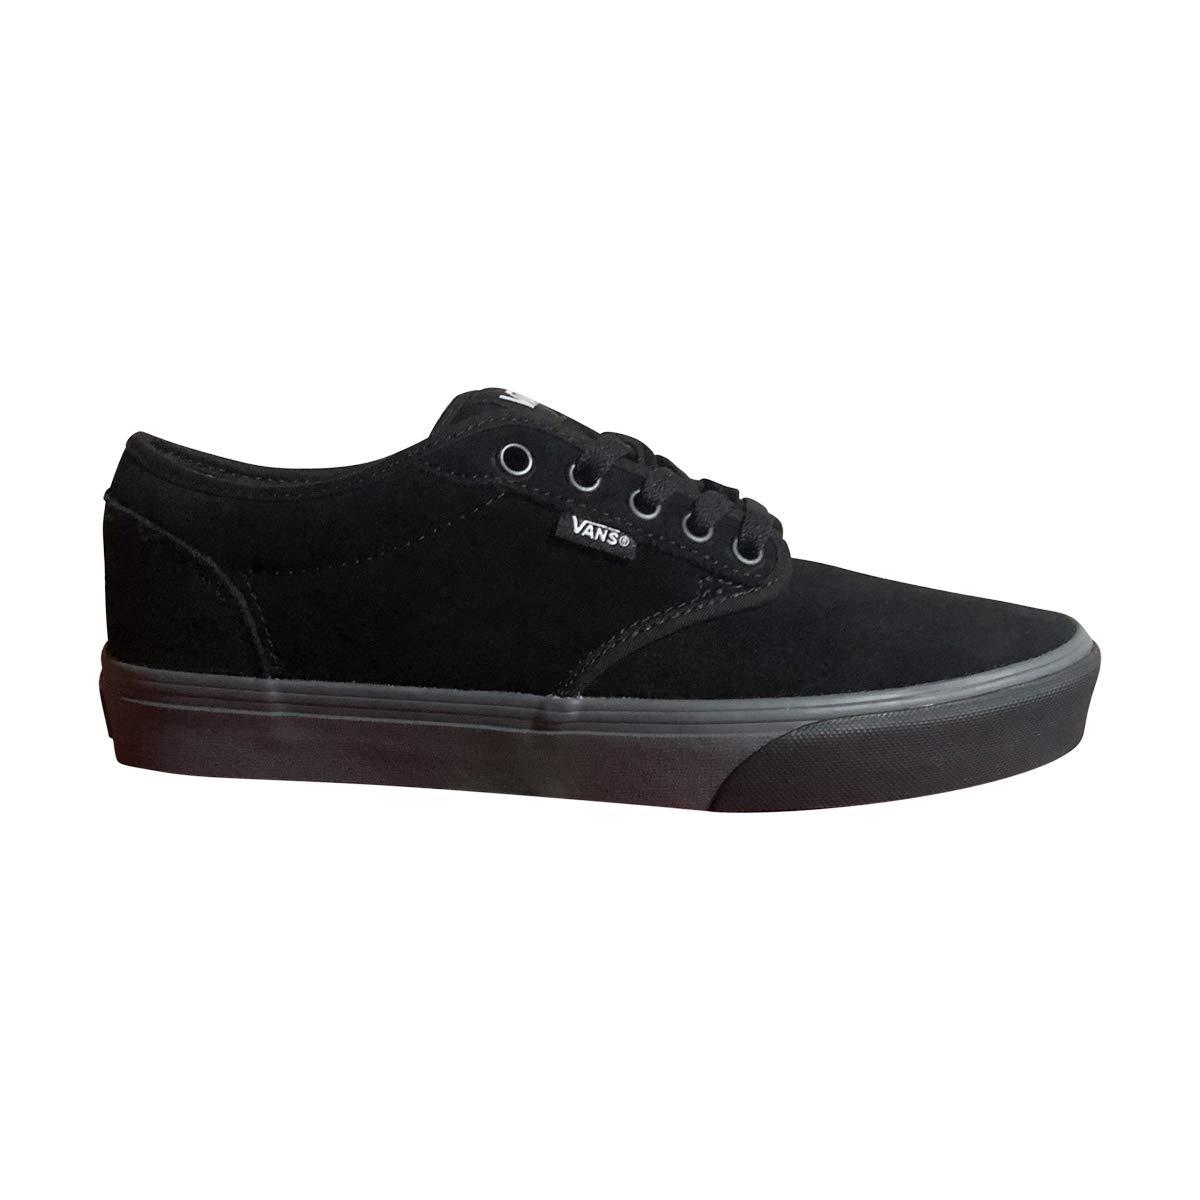 Vans Men's Atwood Skate Shoes (Camo